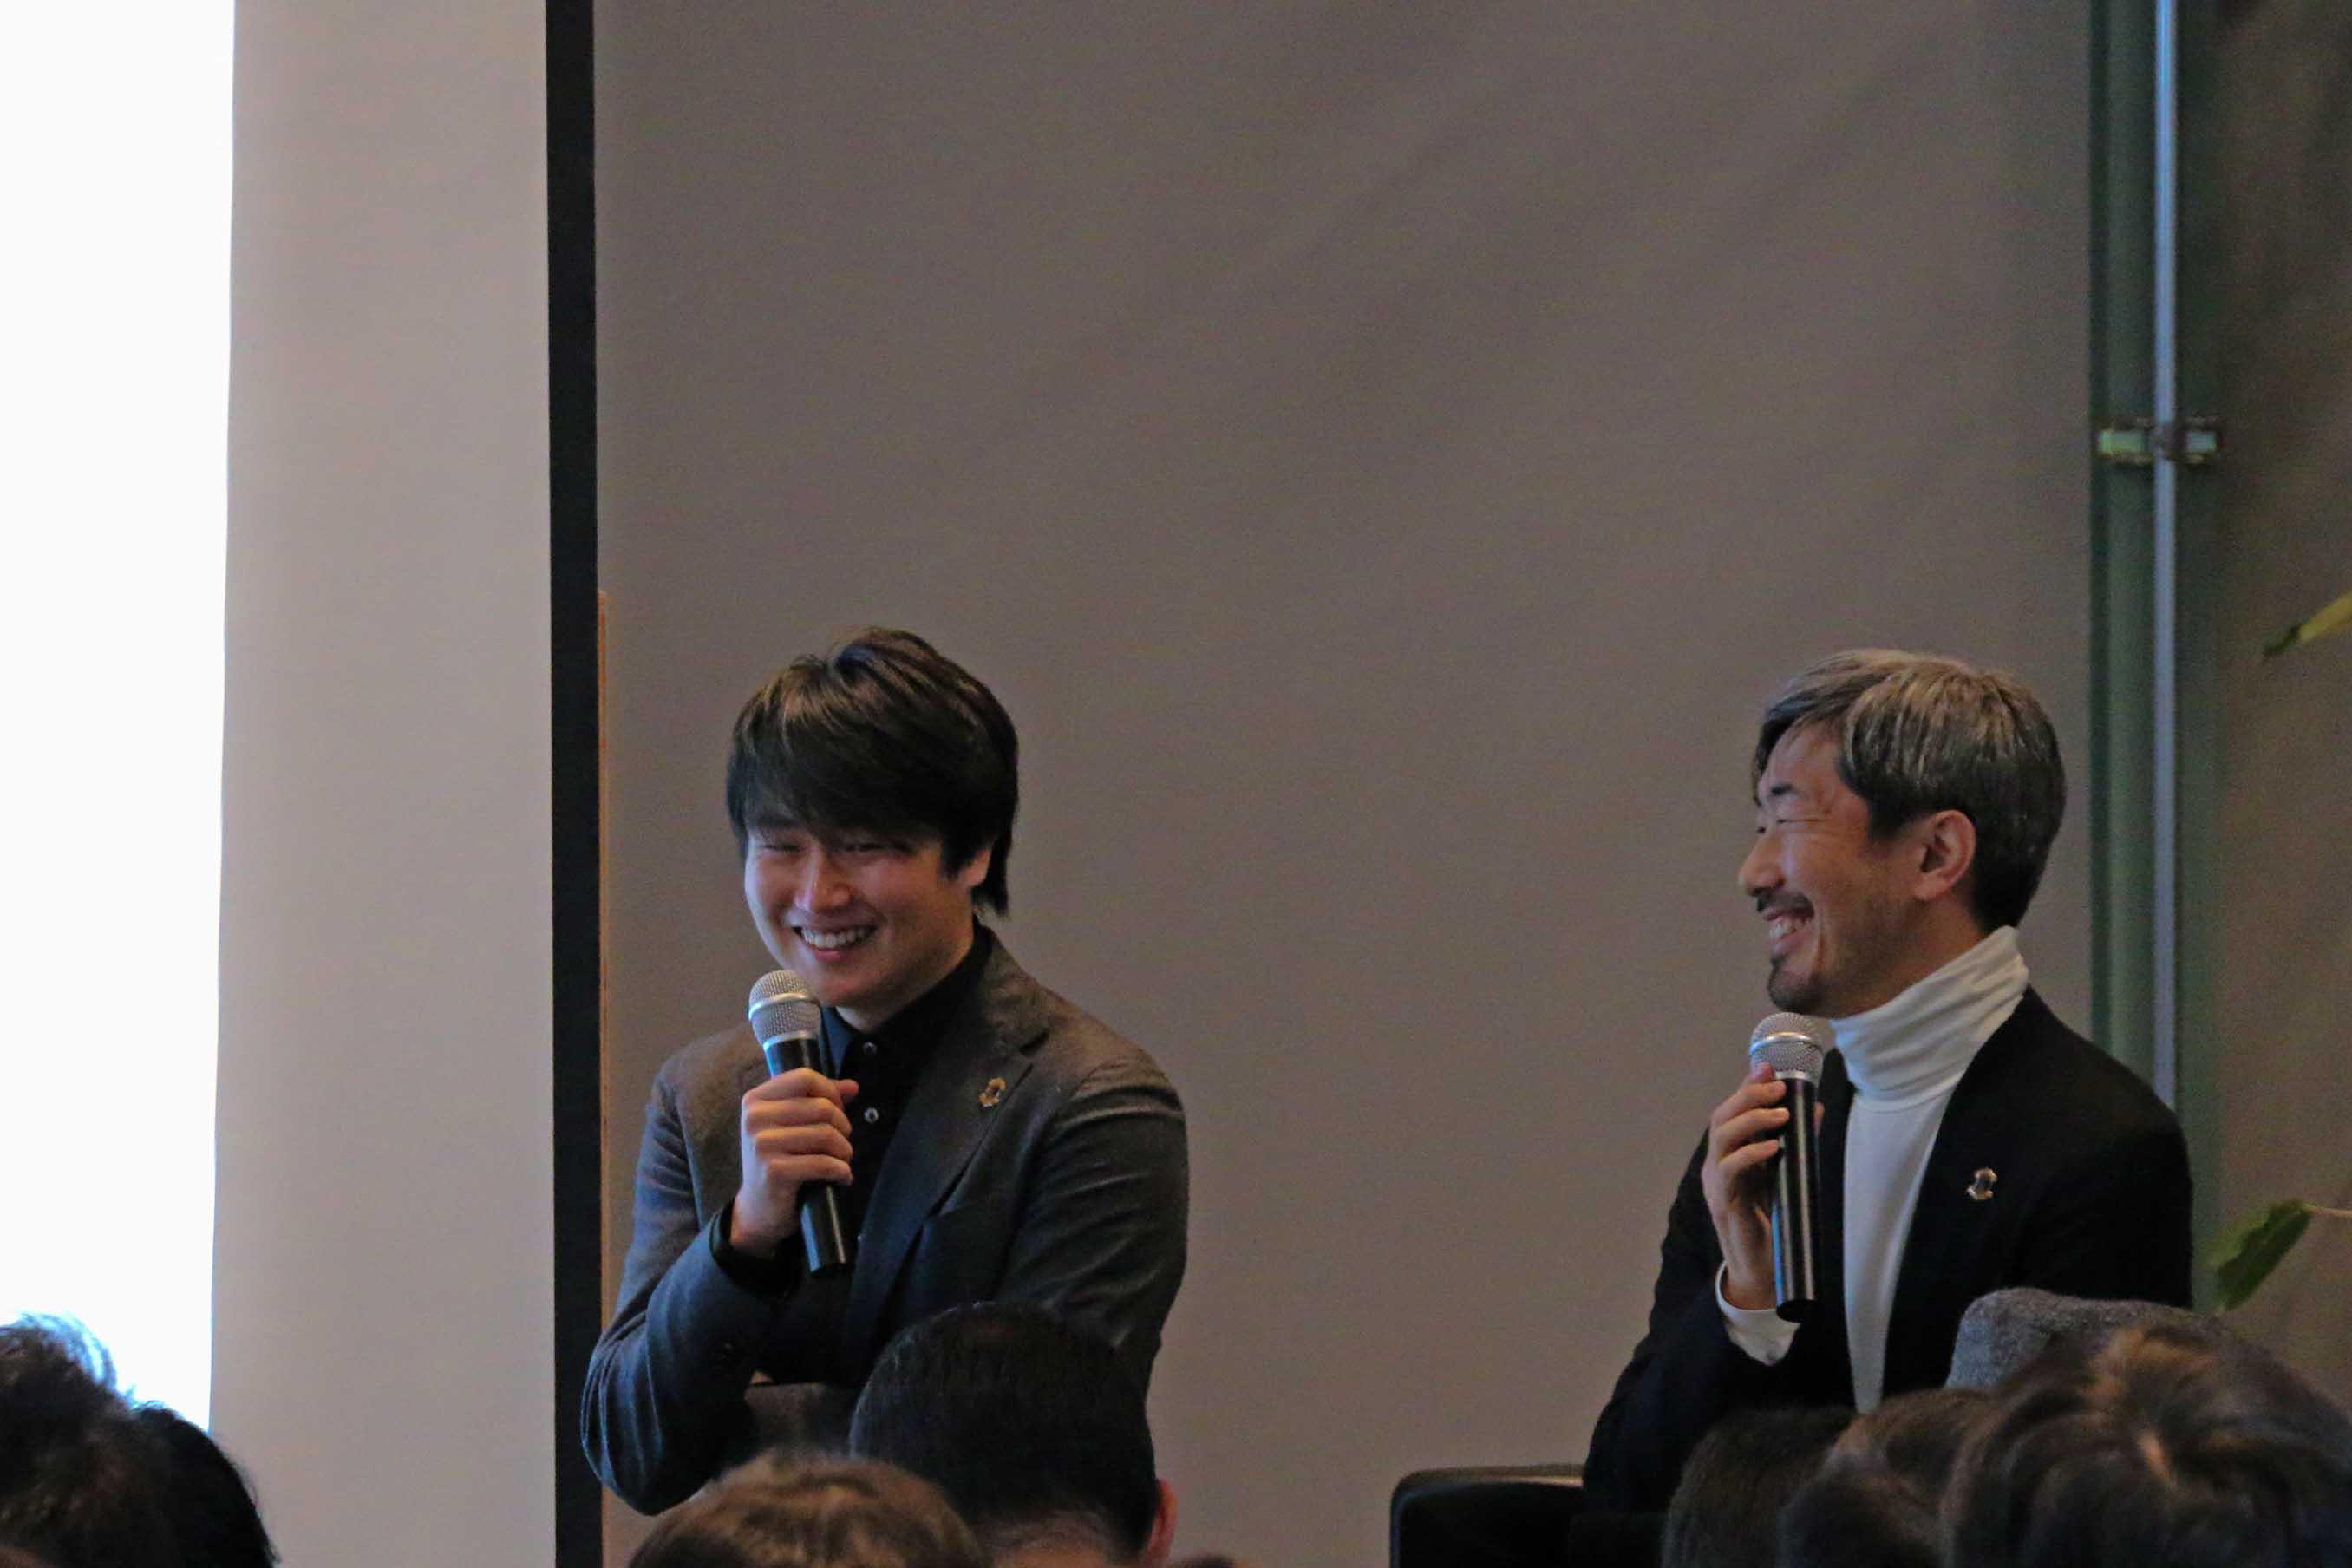 GMの林氏 (左) とクリエイティブディレクターの幅氏。トークセッションは和やかな雰囲気のなか進みました